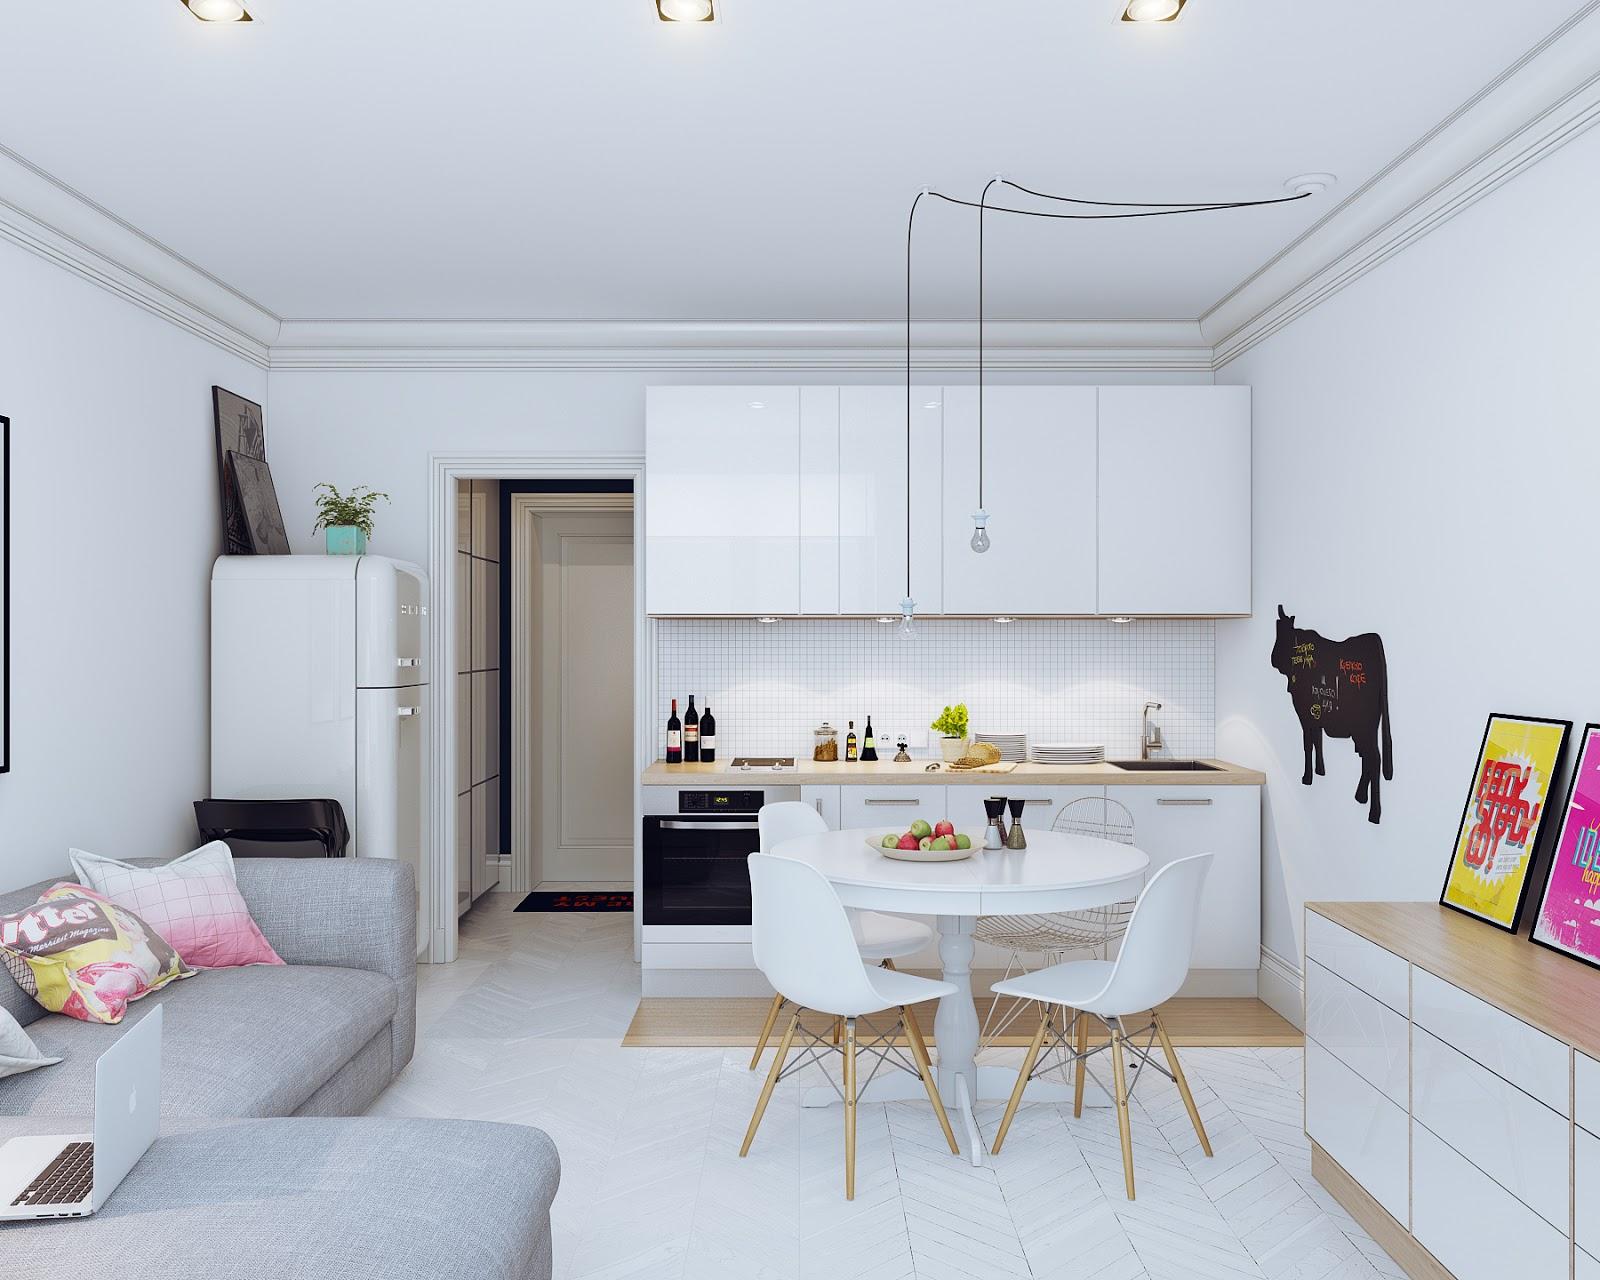 interior design for small living room and kitchen decor ideas photos open plan home interiors